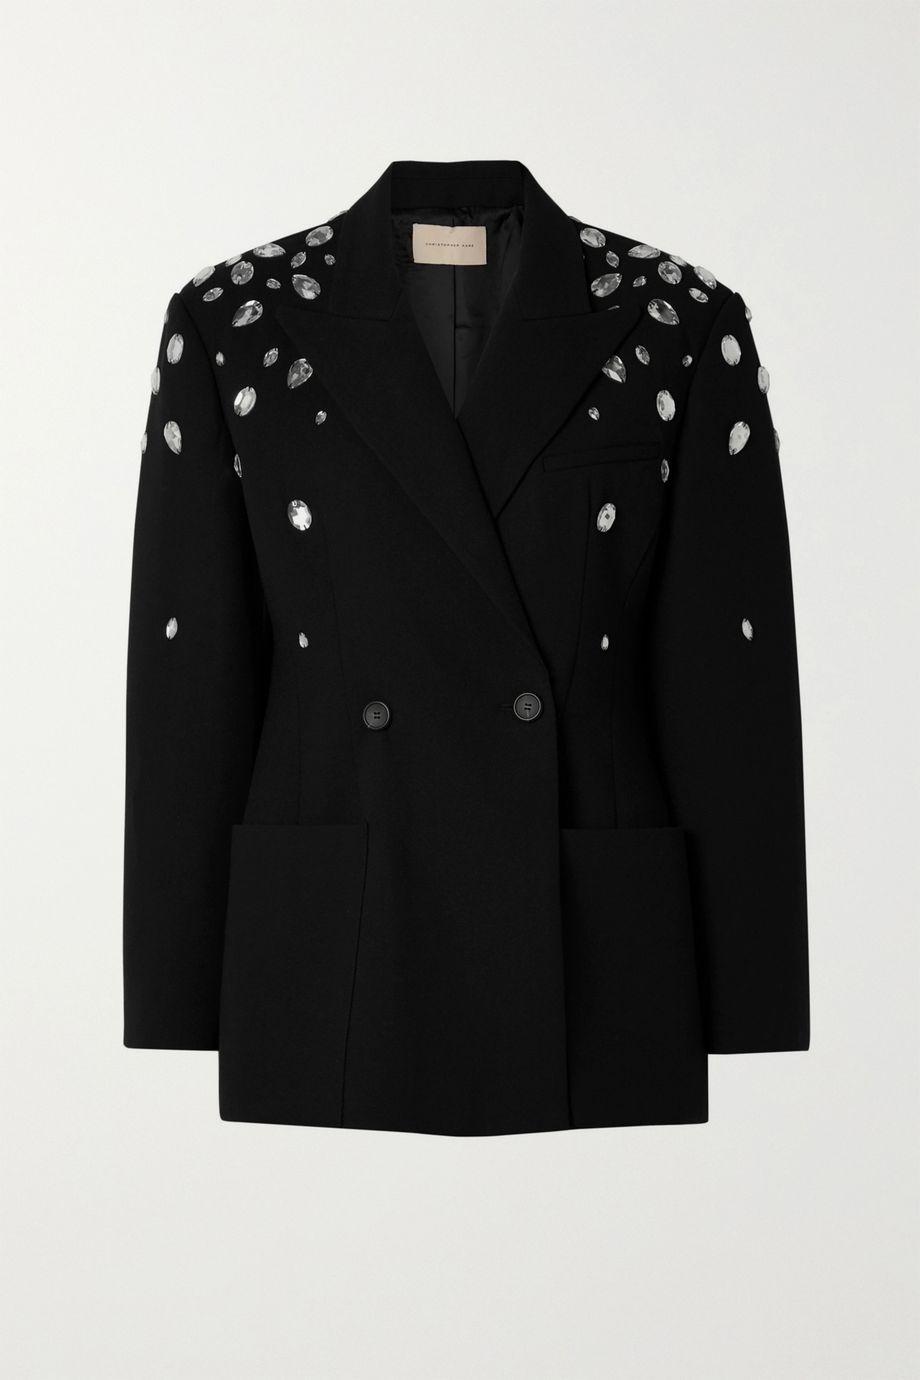 Christopher Kane Double-breasted crystal-embellished crepe blazer